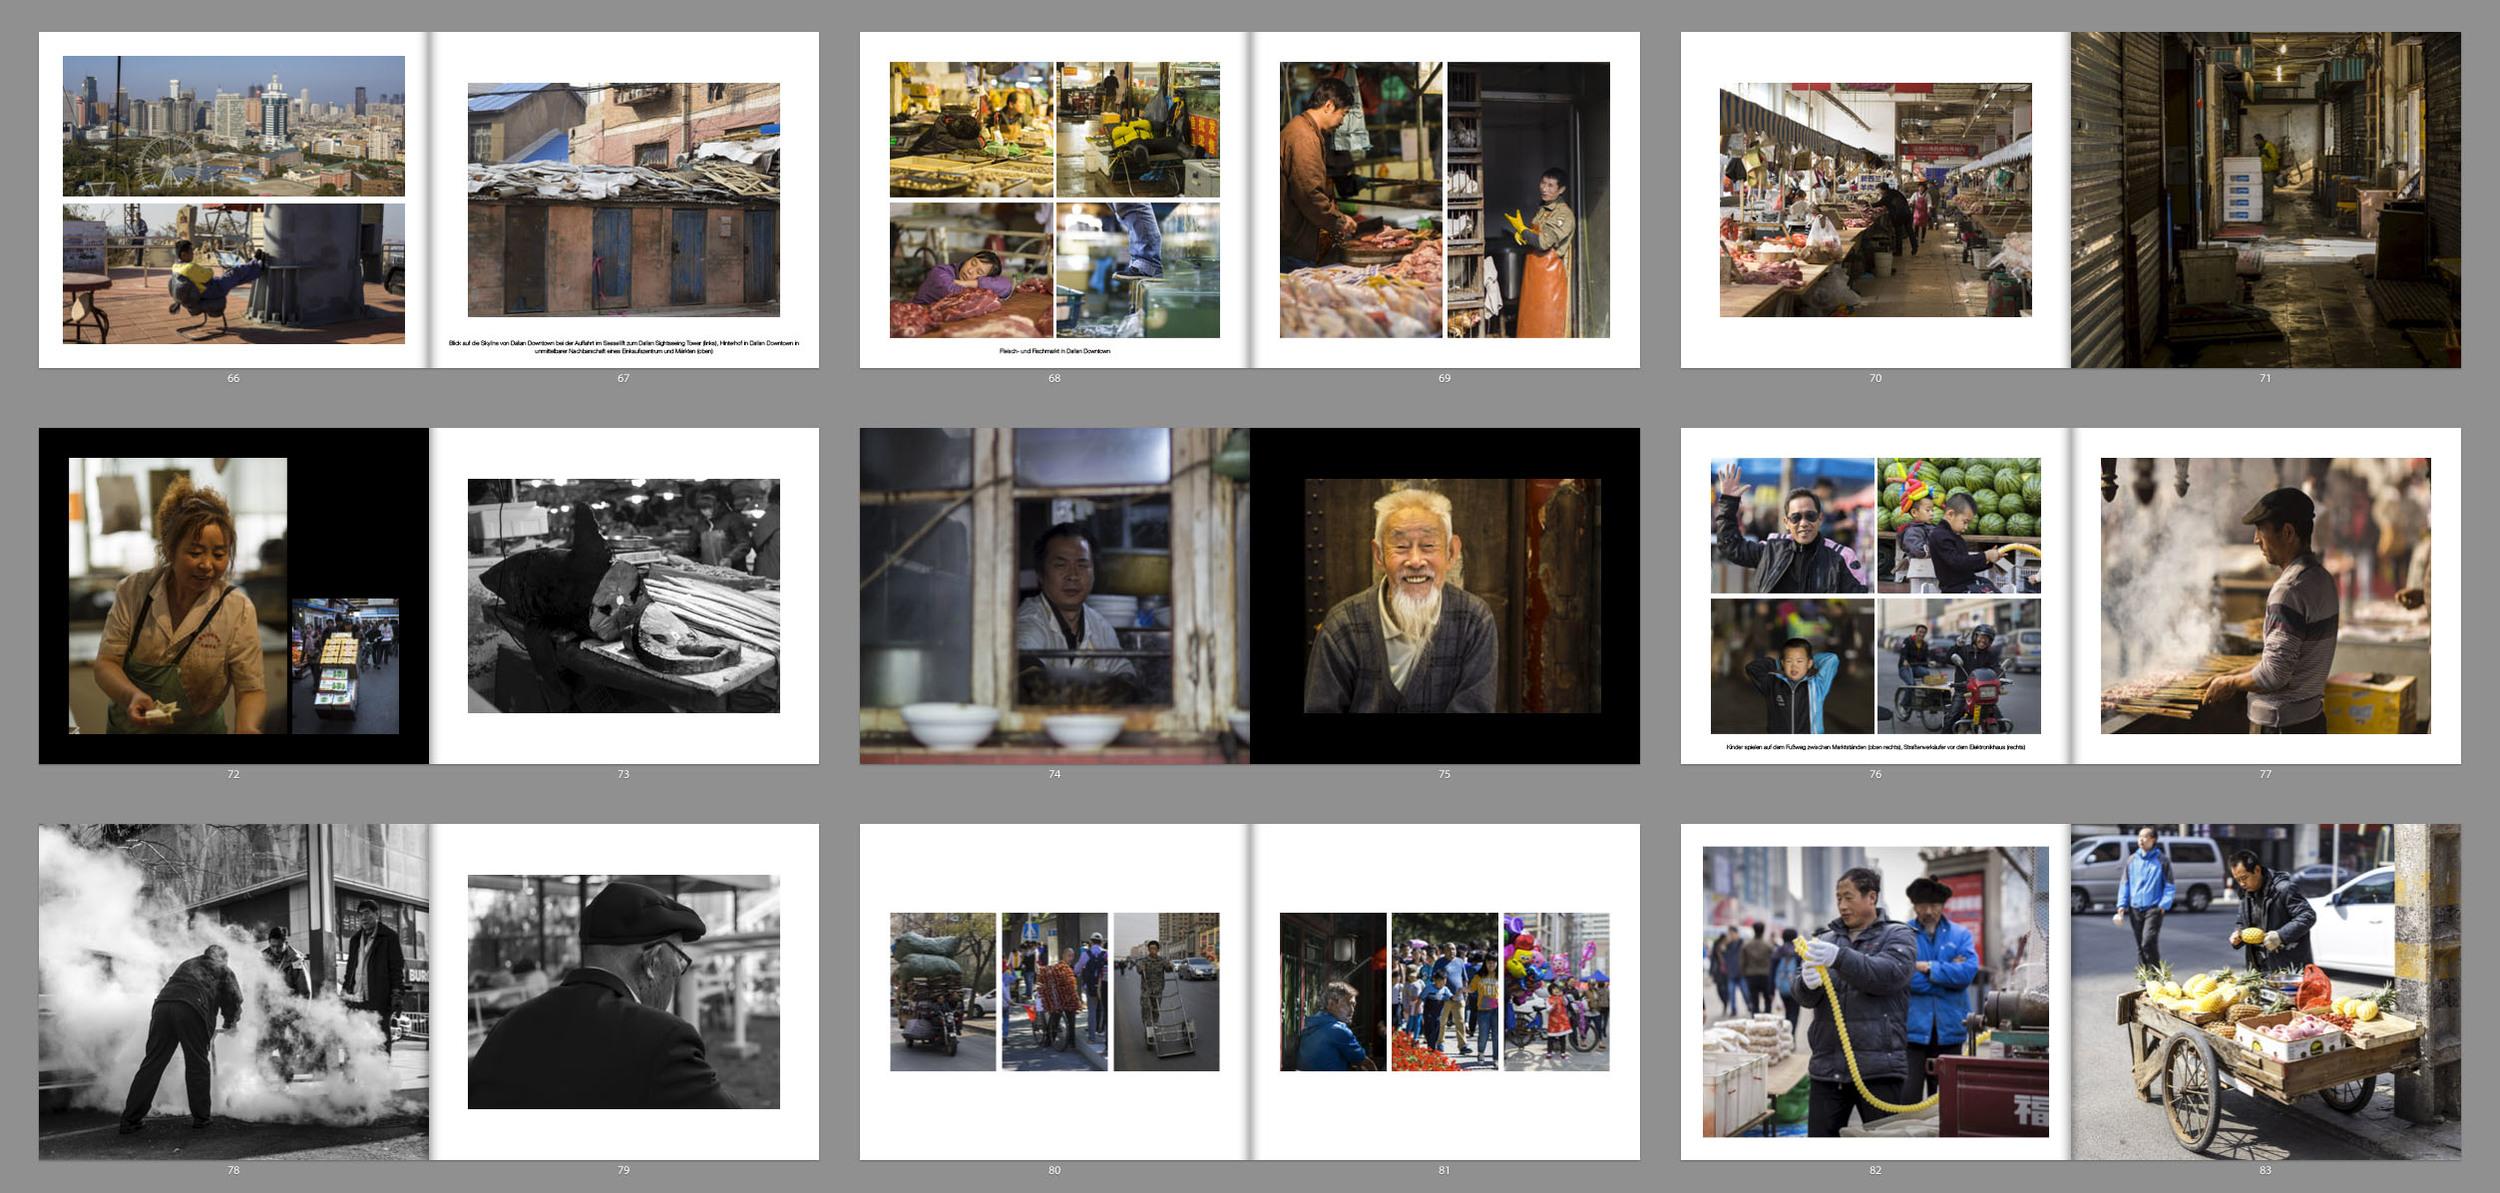 China Photobook Page 66-83.jpg